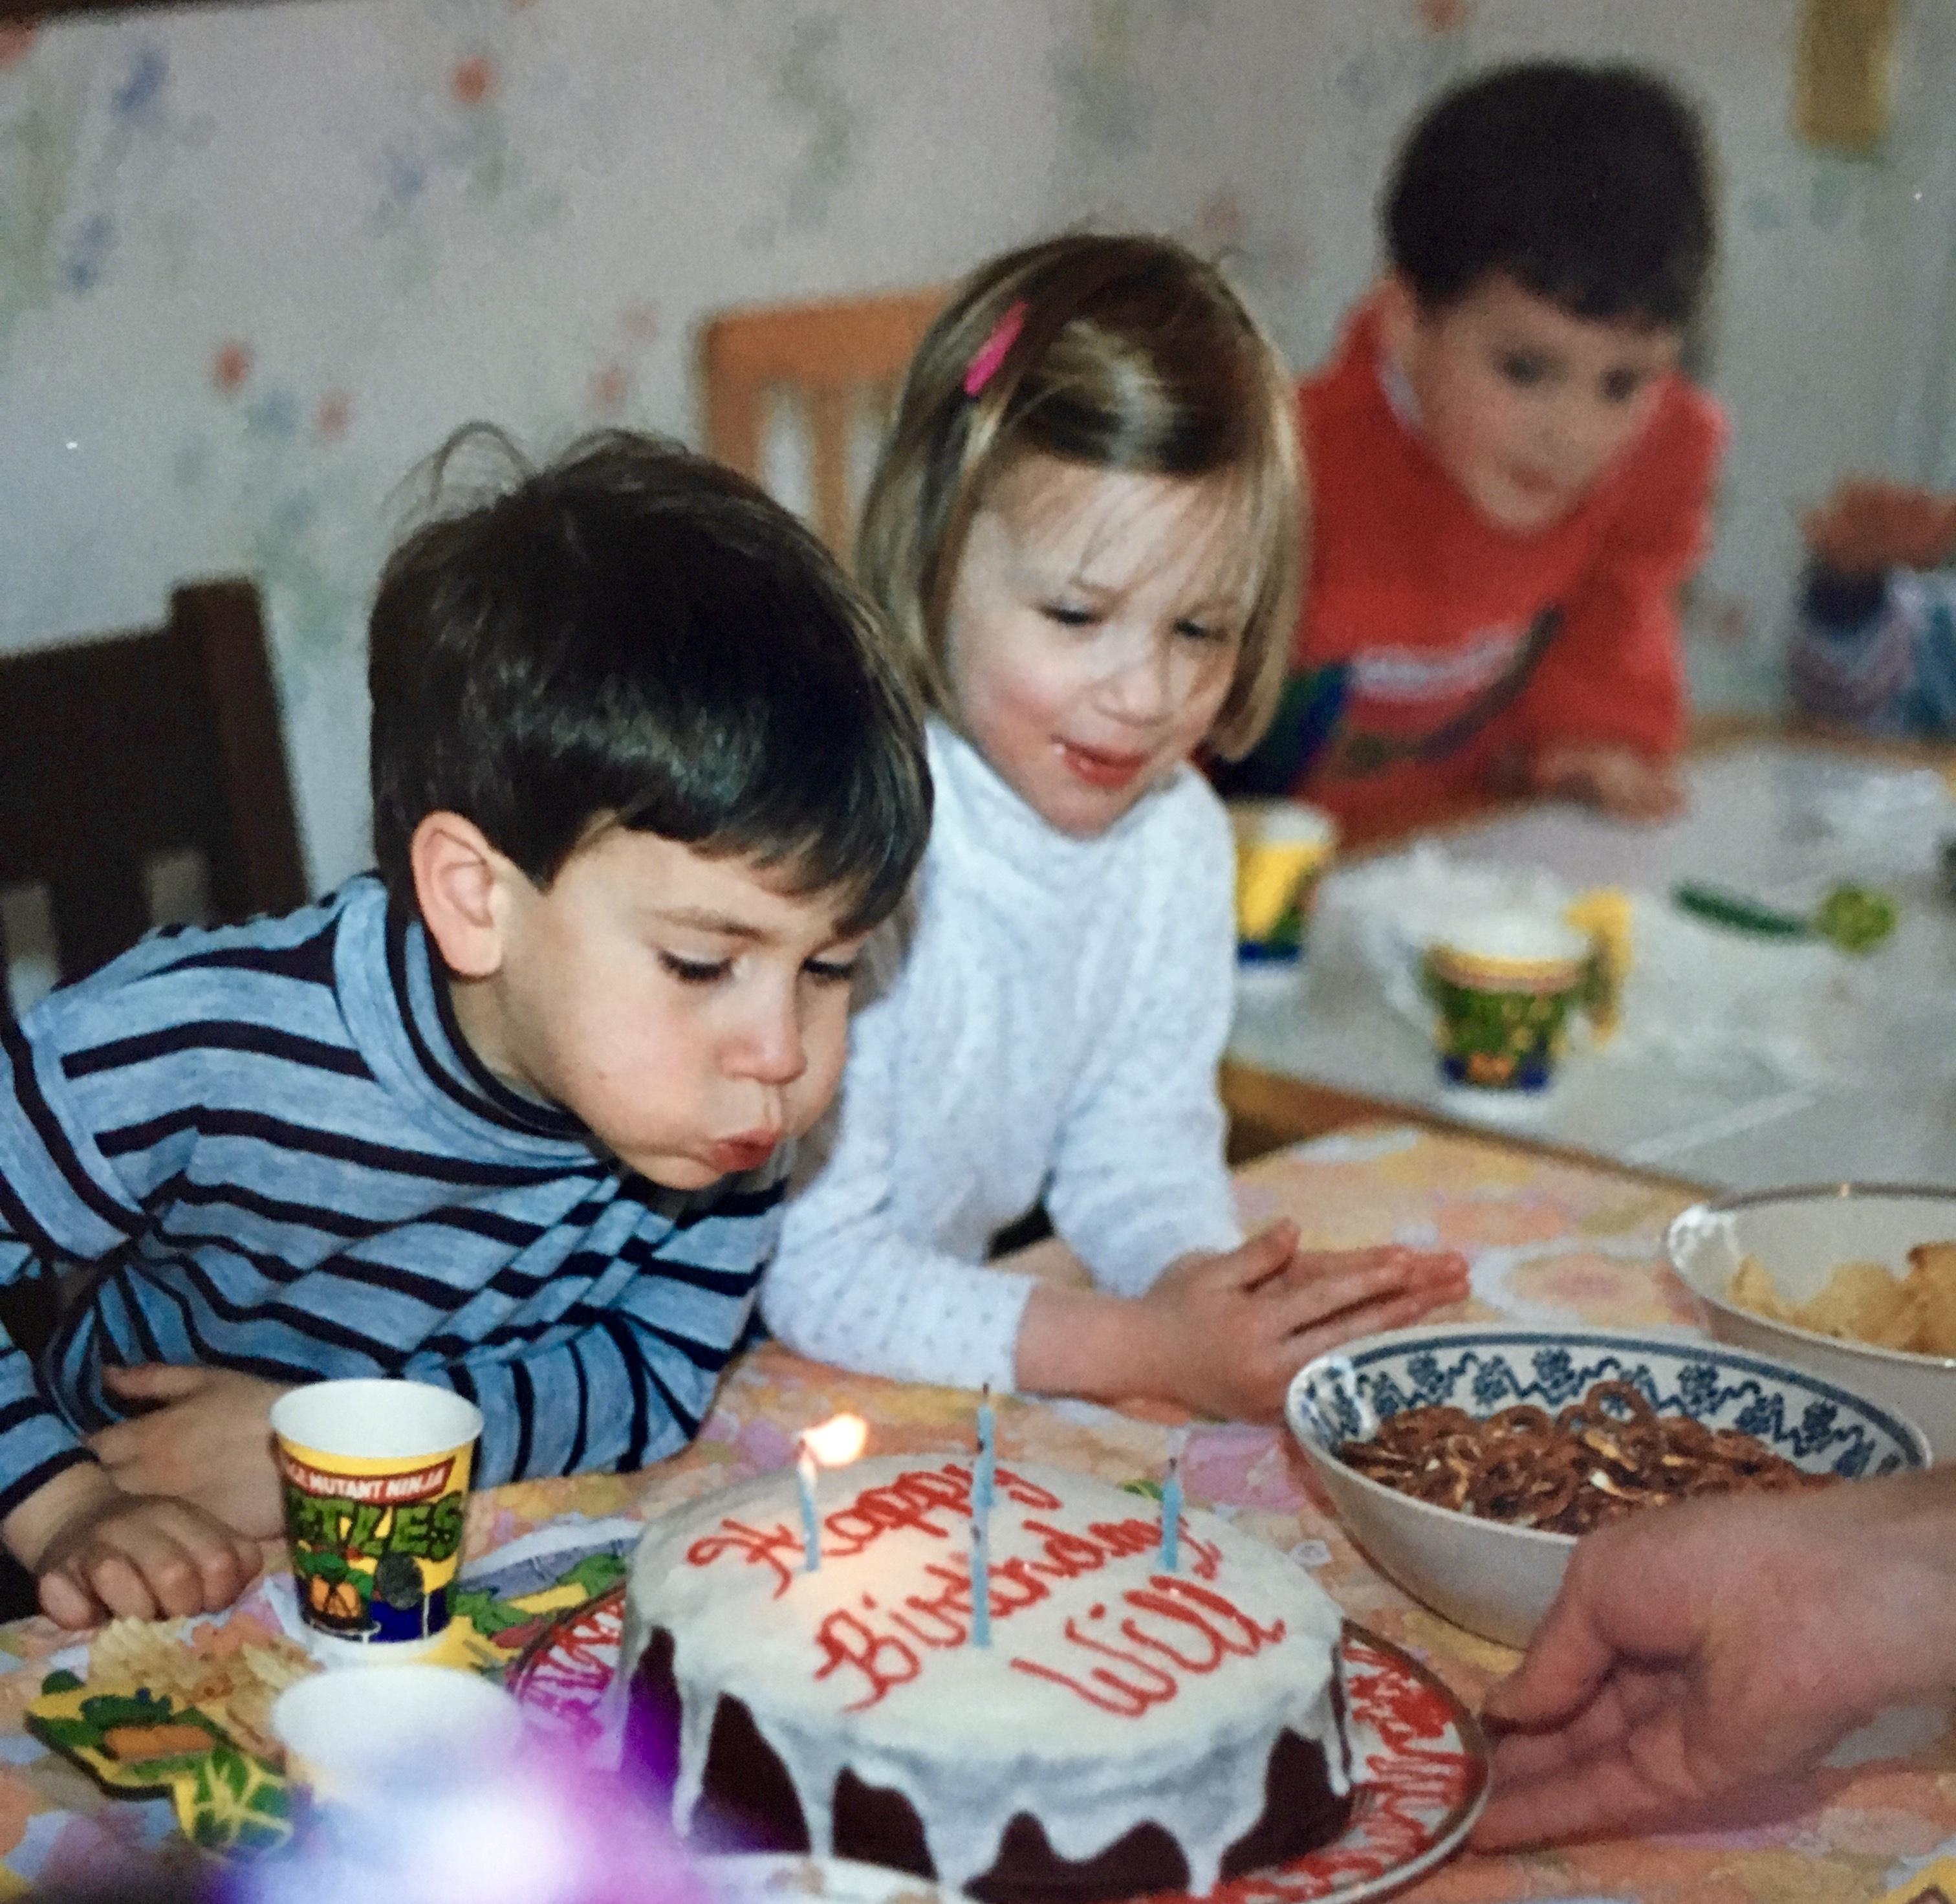 Will at his birthday